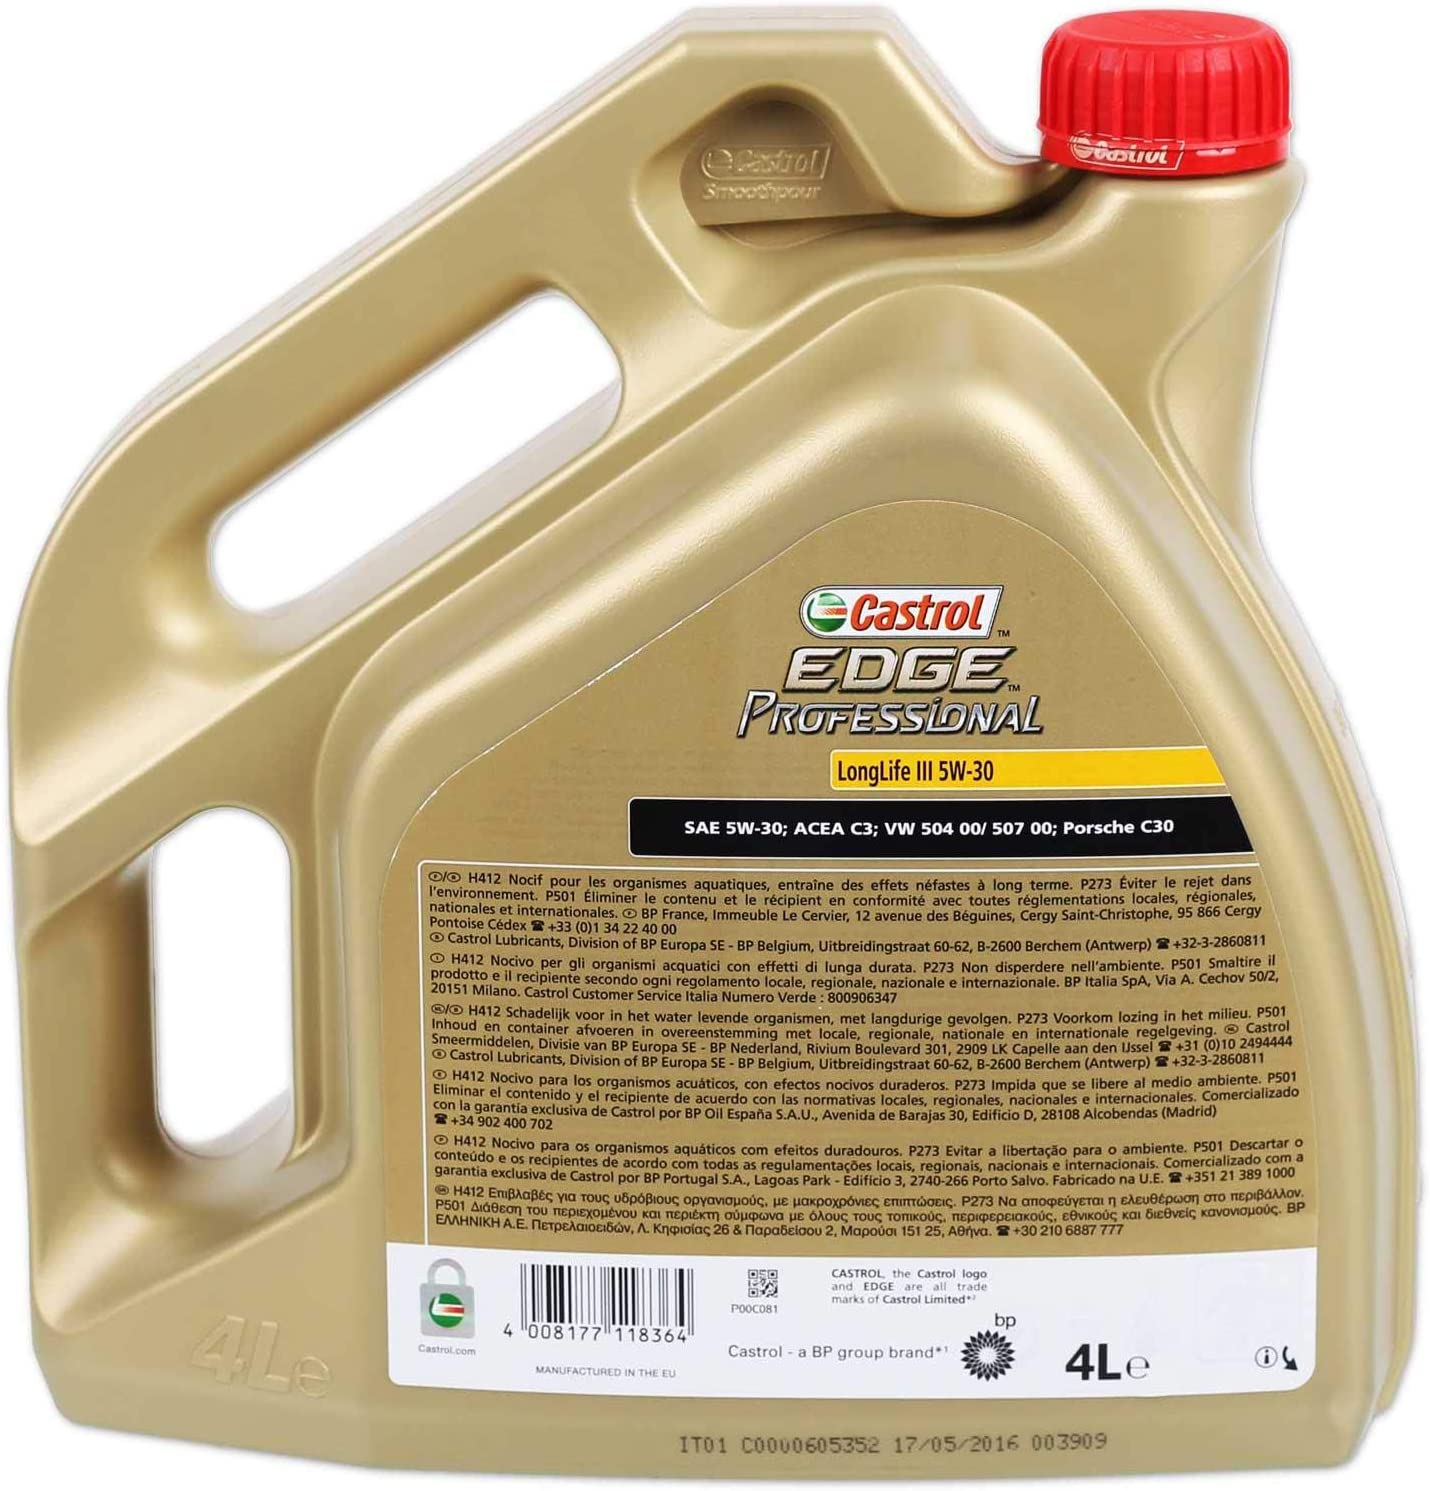 Castrol Edge Professional Longlife Iii 5w 30 Motoröl 4l Auto